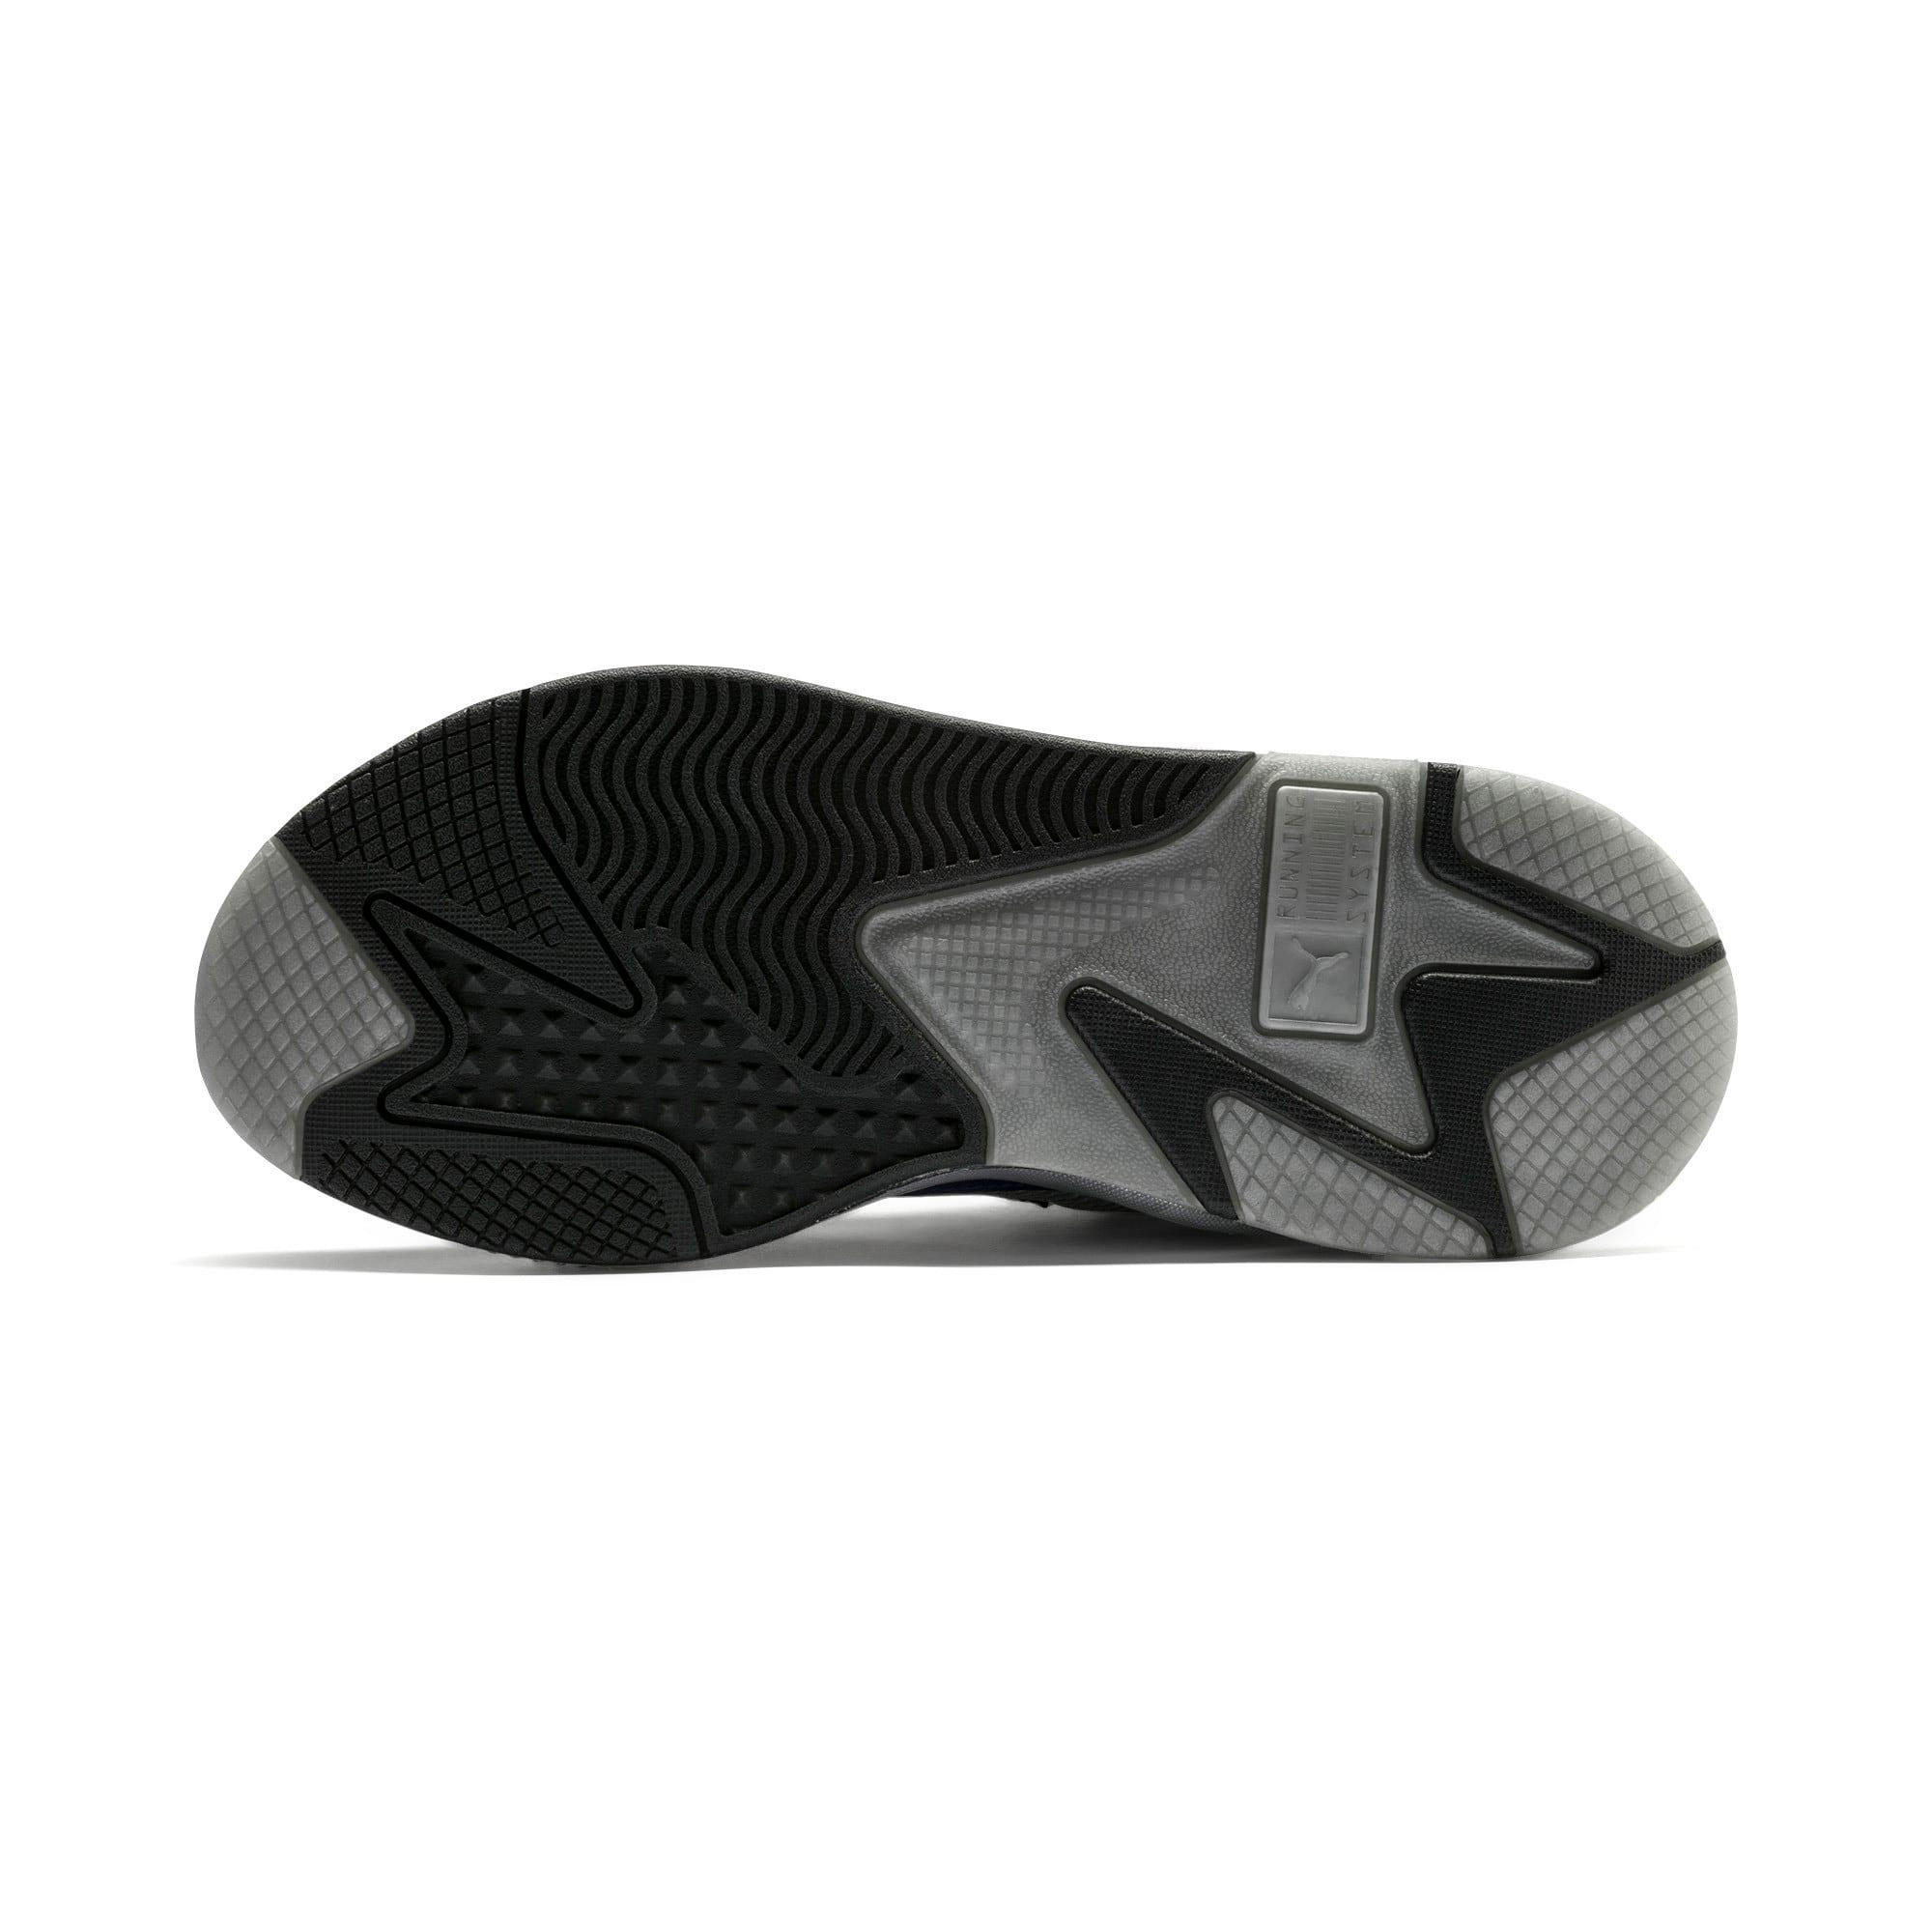 Thumbnail 4 of RS-X Tech Motorola Sneakers, Puma Silver-Sodalite Blue, medium